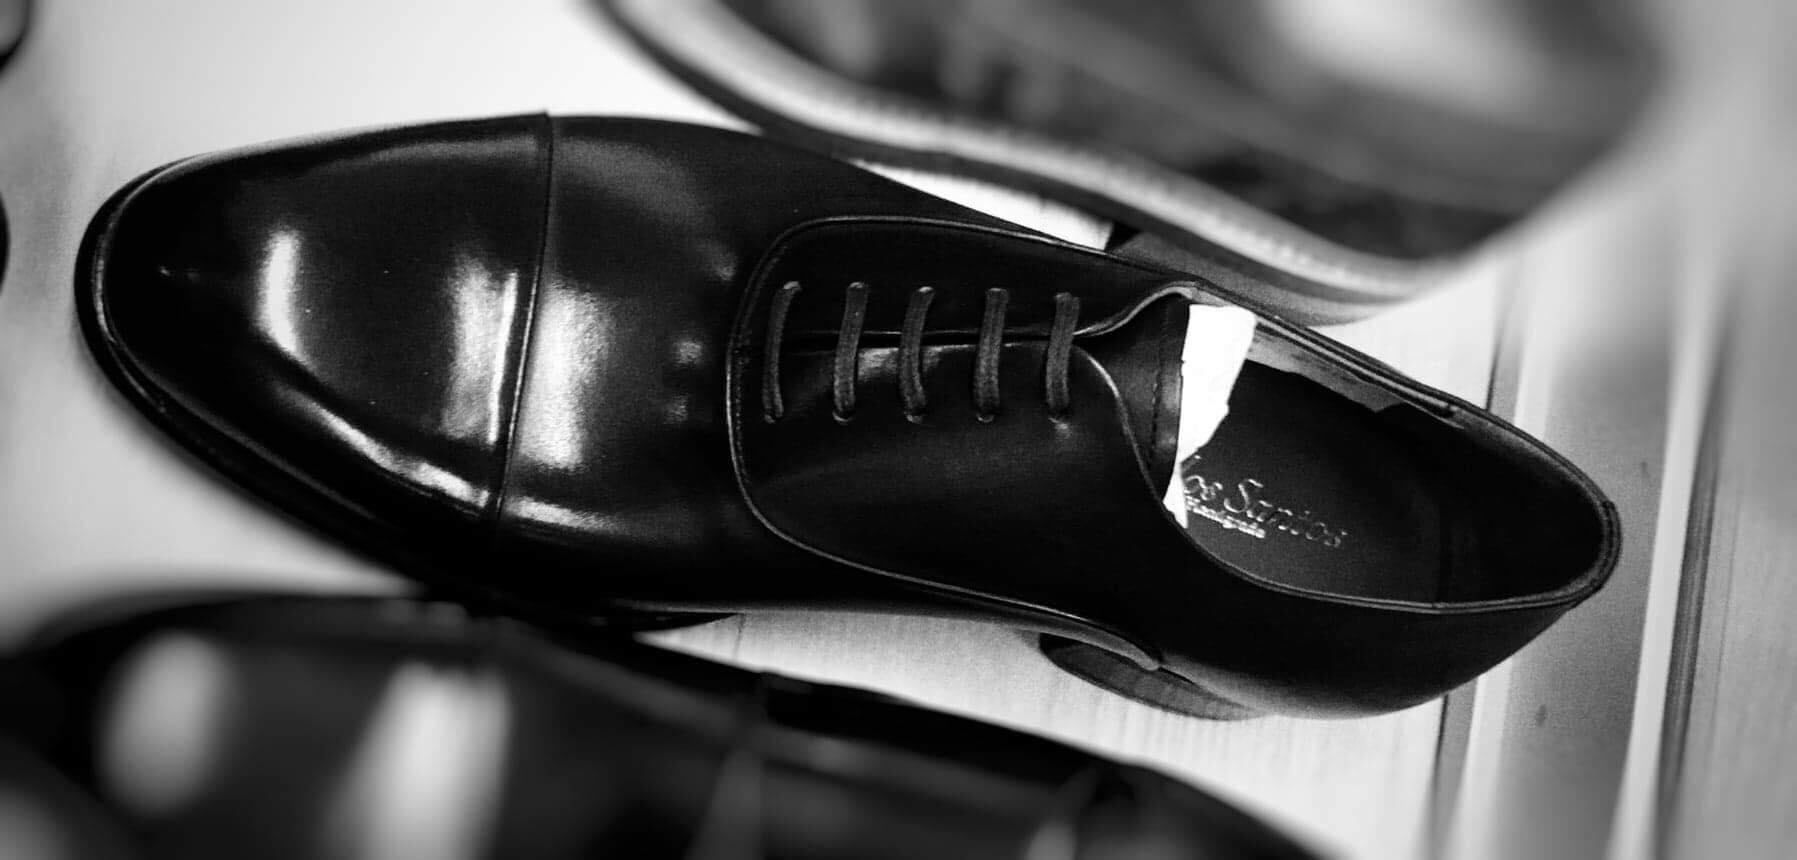 Carlos Santos 9899 Handgrade Oxford in Black Calf Exclusively for The Noble Shoe